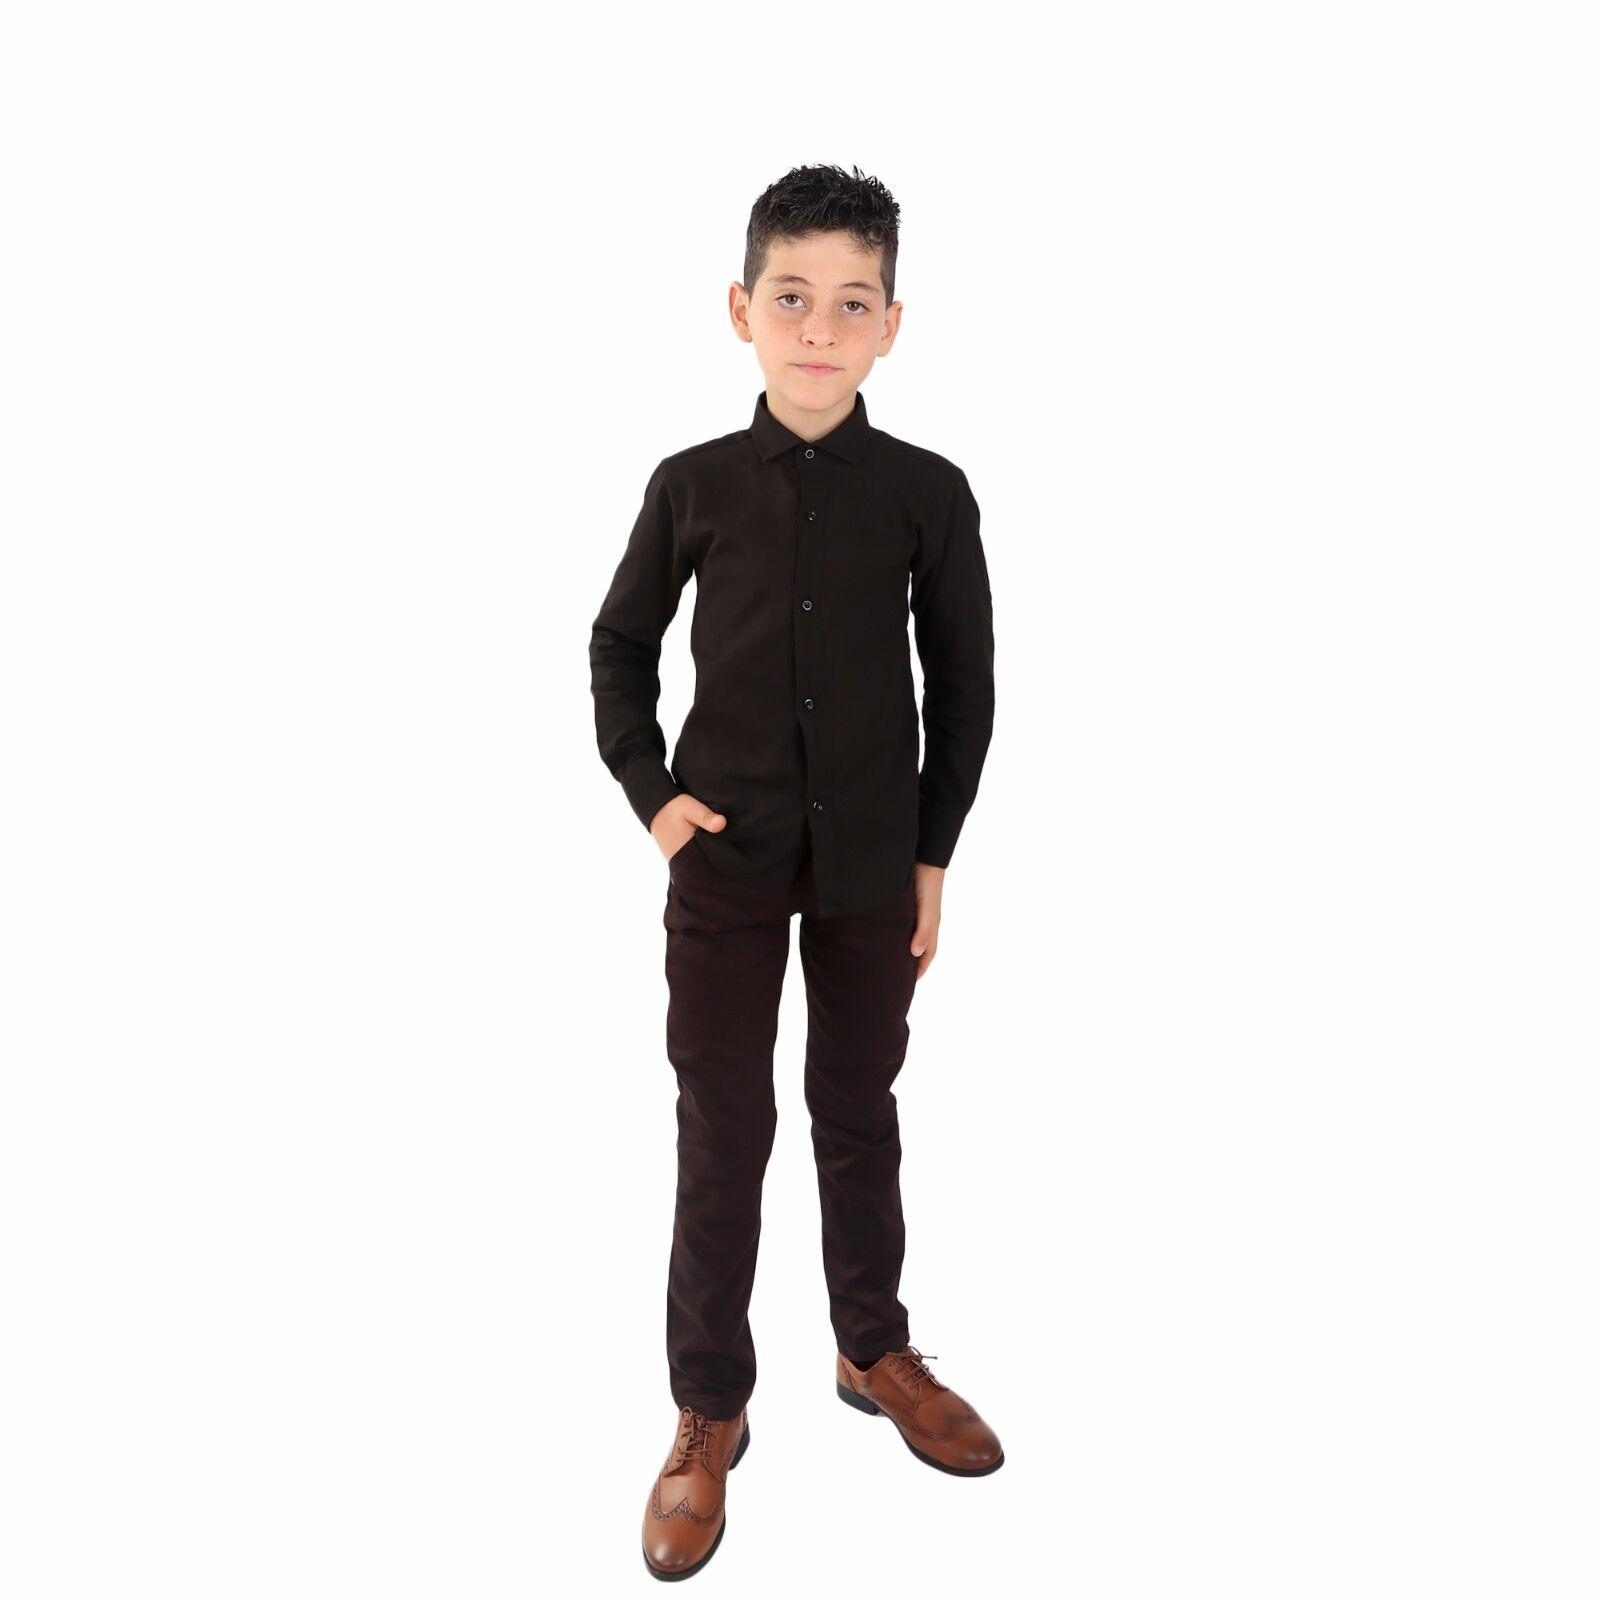 Boys Linen Black Shirts Kids Summer Long Sleeve Shirts Roll Up Sleeve Boy Shirt